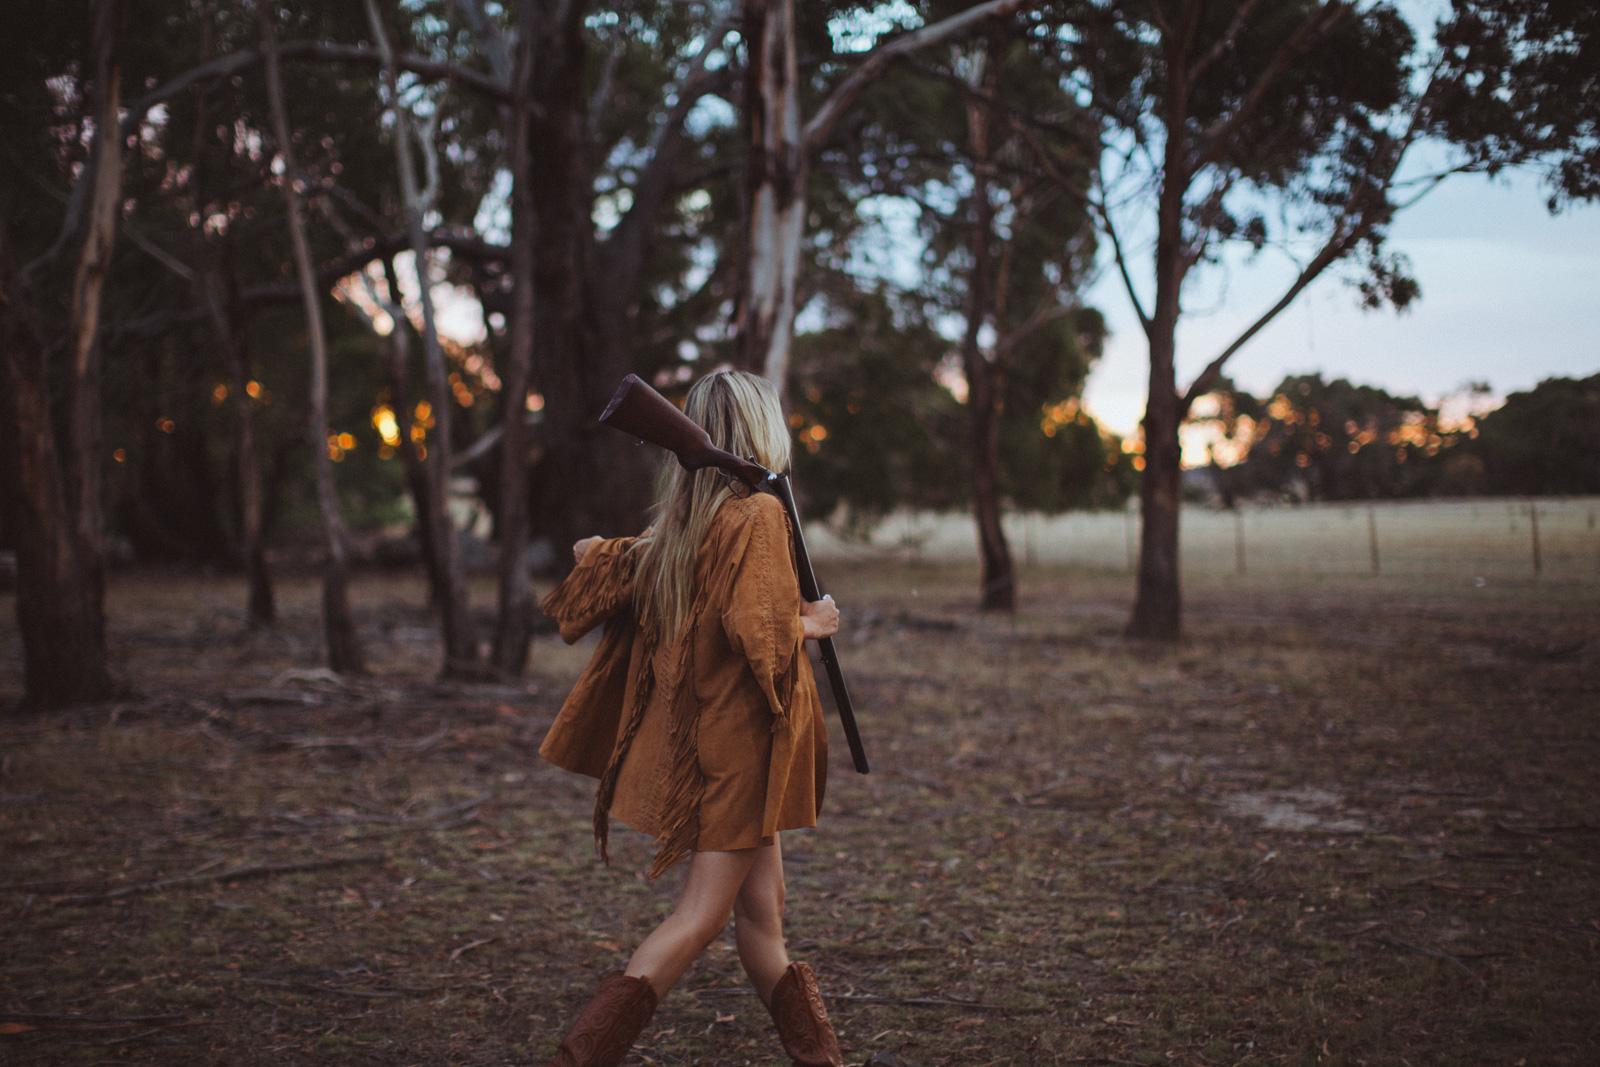 Dallas Jays-Dean Raphael-Melbourne Fashion photographer-12.jpg